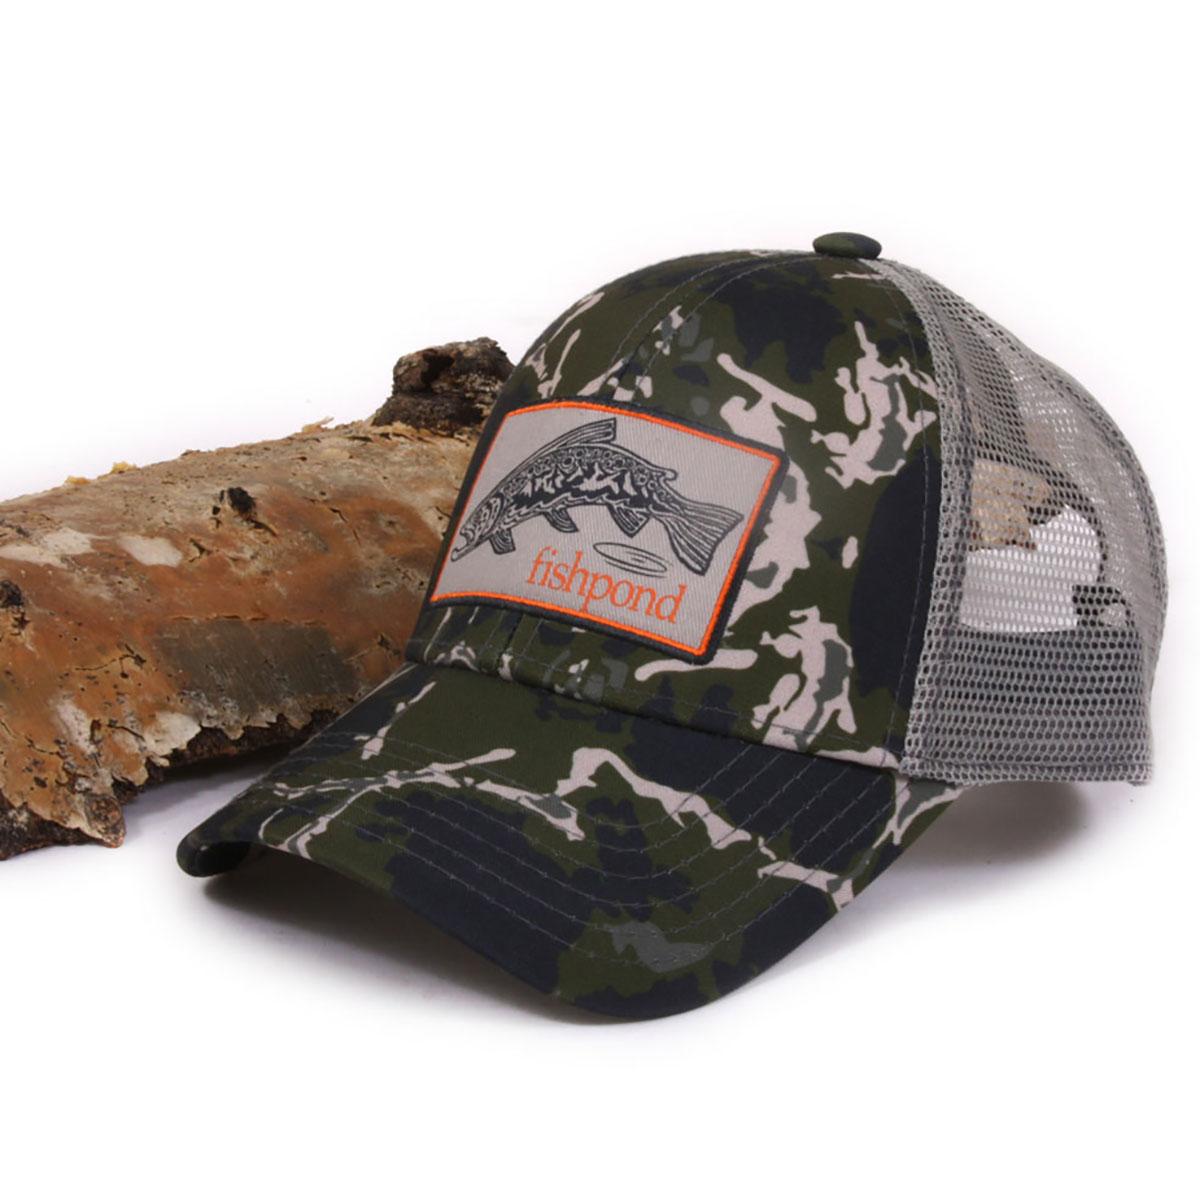 Fishpond Trucha Logo Adjustable Velcro Fly Fishing Hat Cap